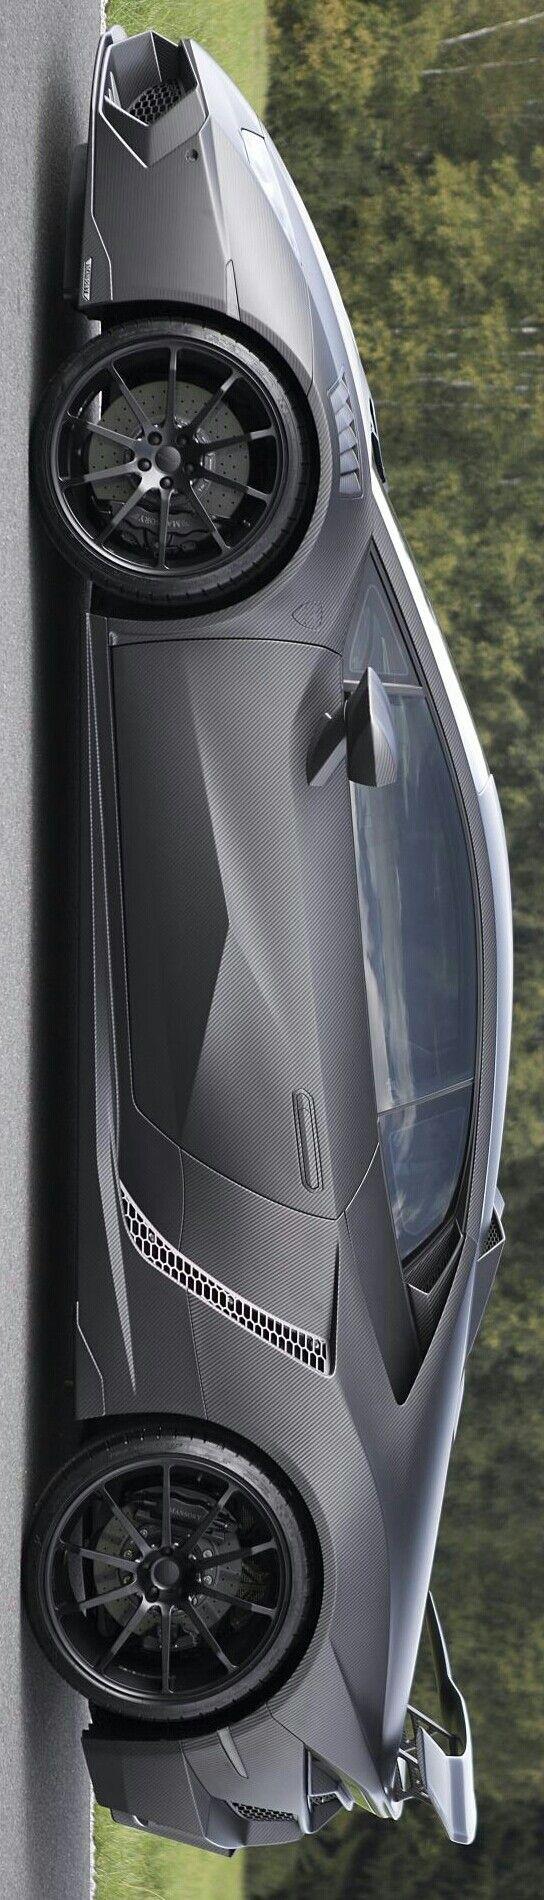 2016 MANSORY TOROFEO Lamborghini Huracan by Levon